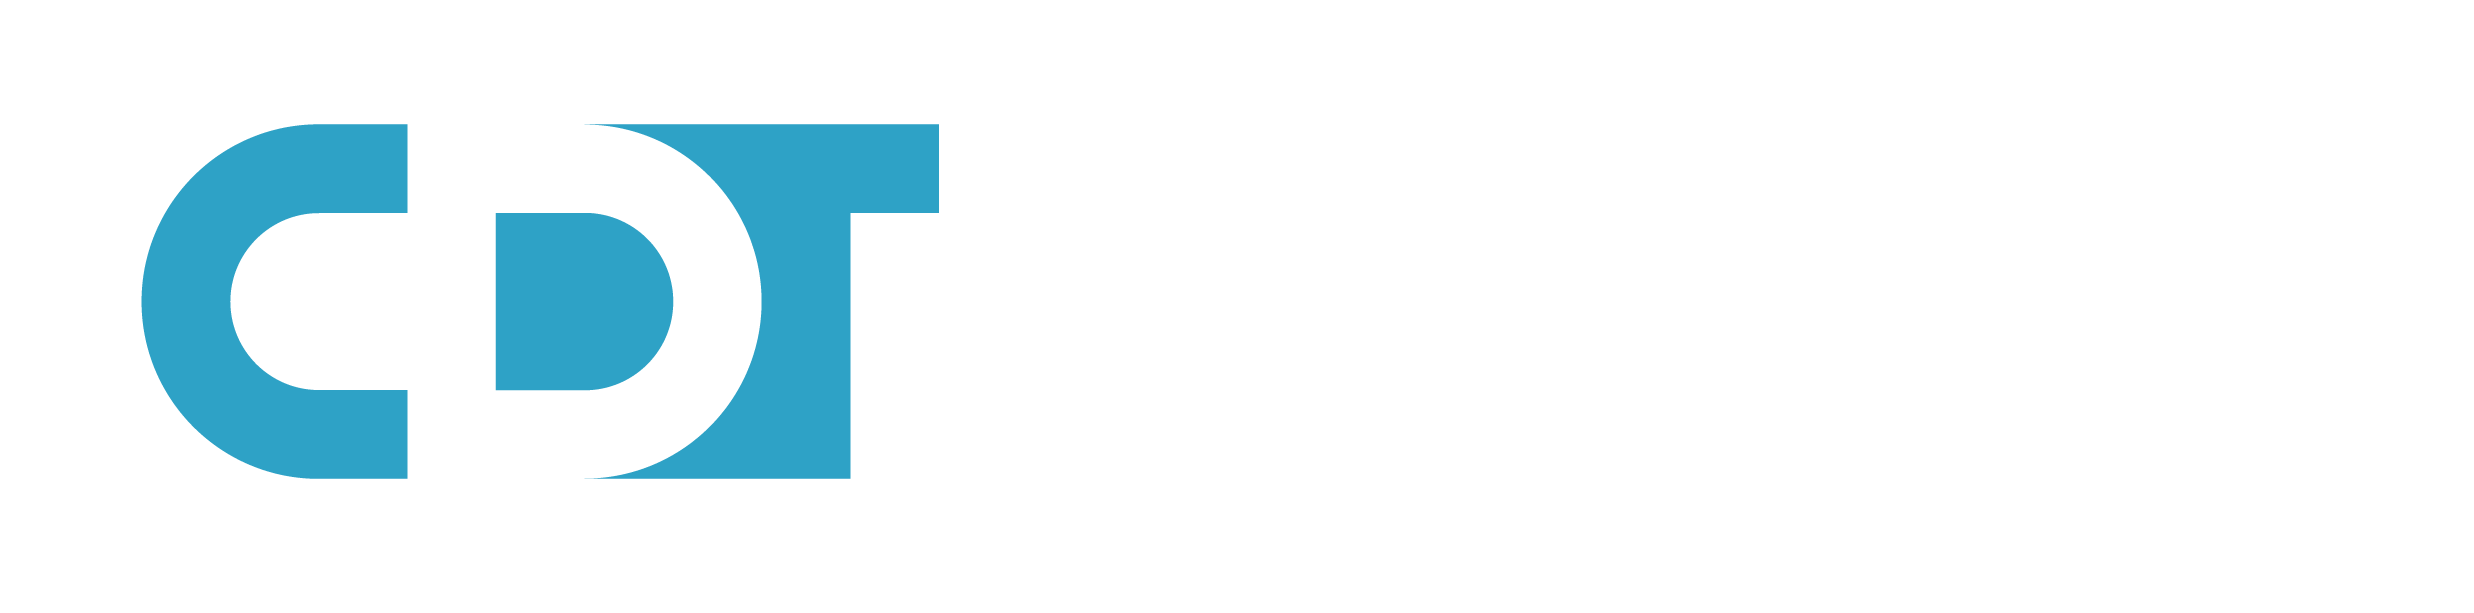 creative divorce toronto V2-Inversed-01